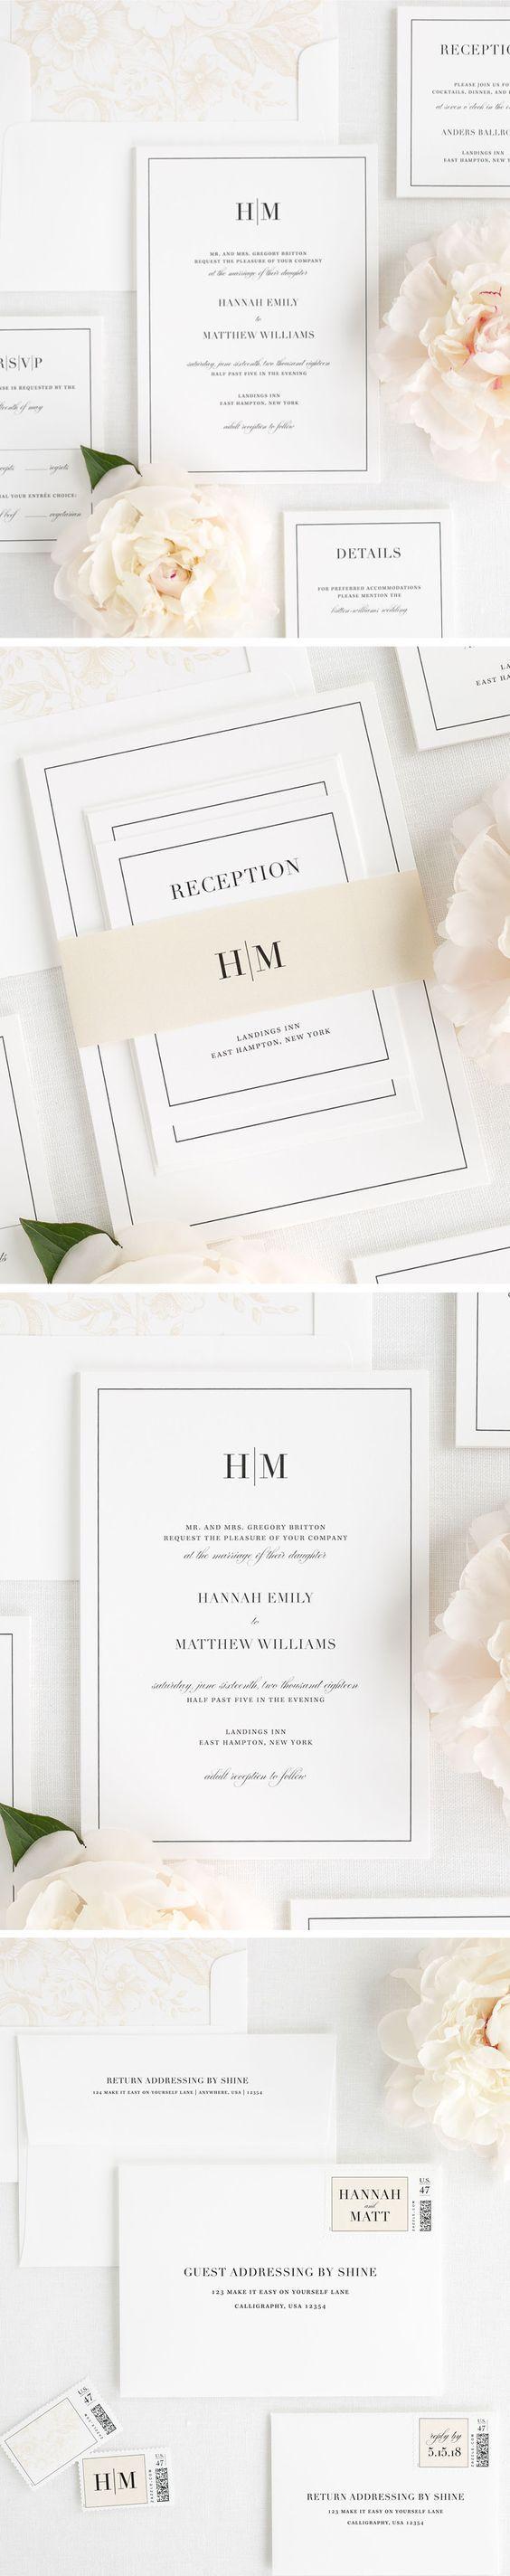 1137 best Wedding Invitation images on Pinterest